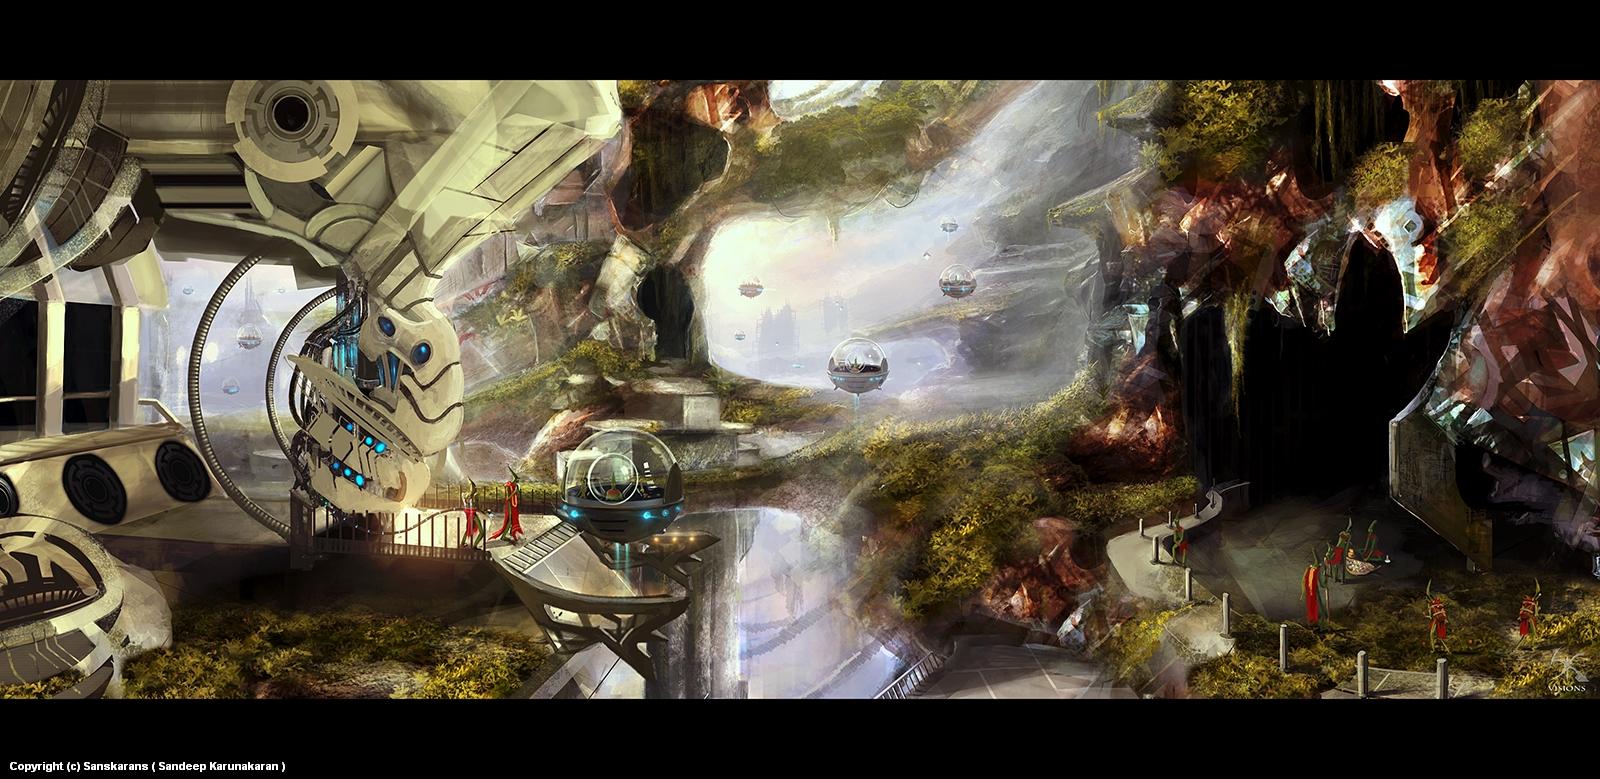 Alien World Artwork by Sandeep Karunakaran